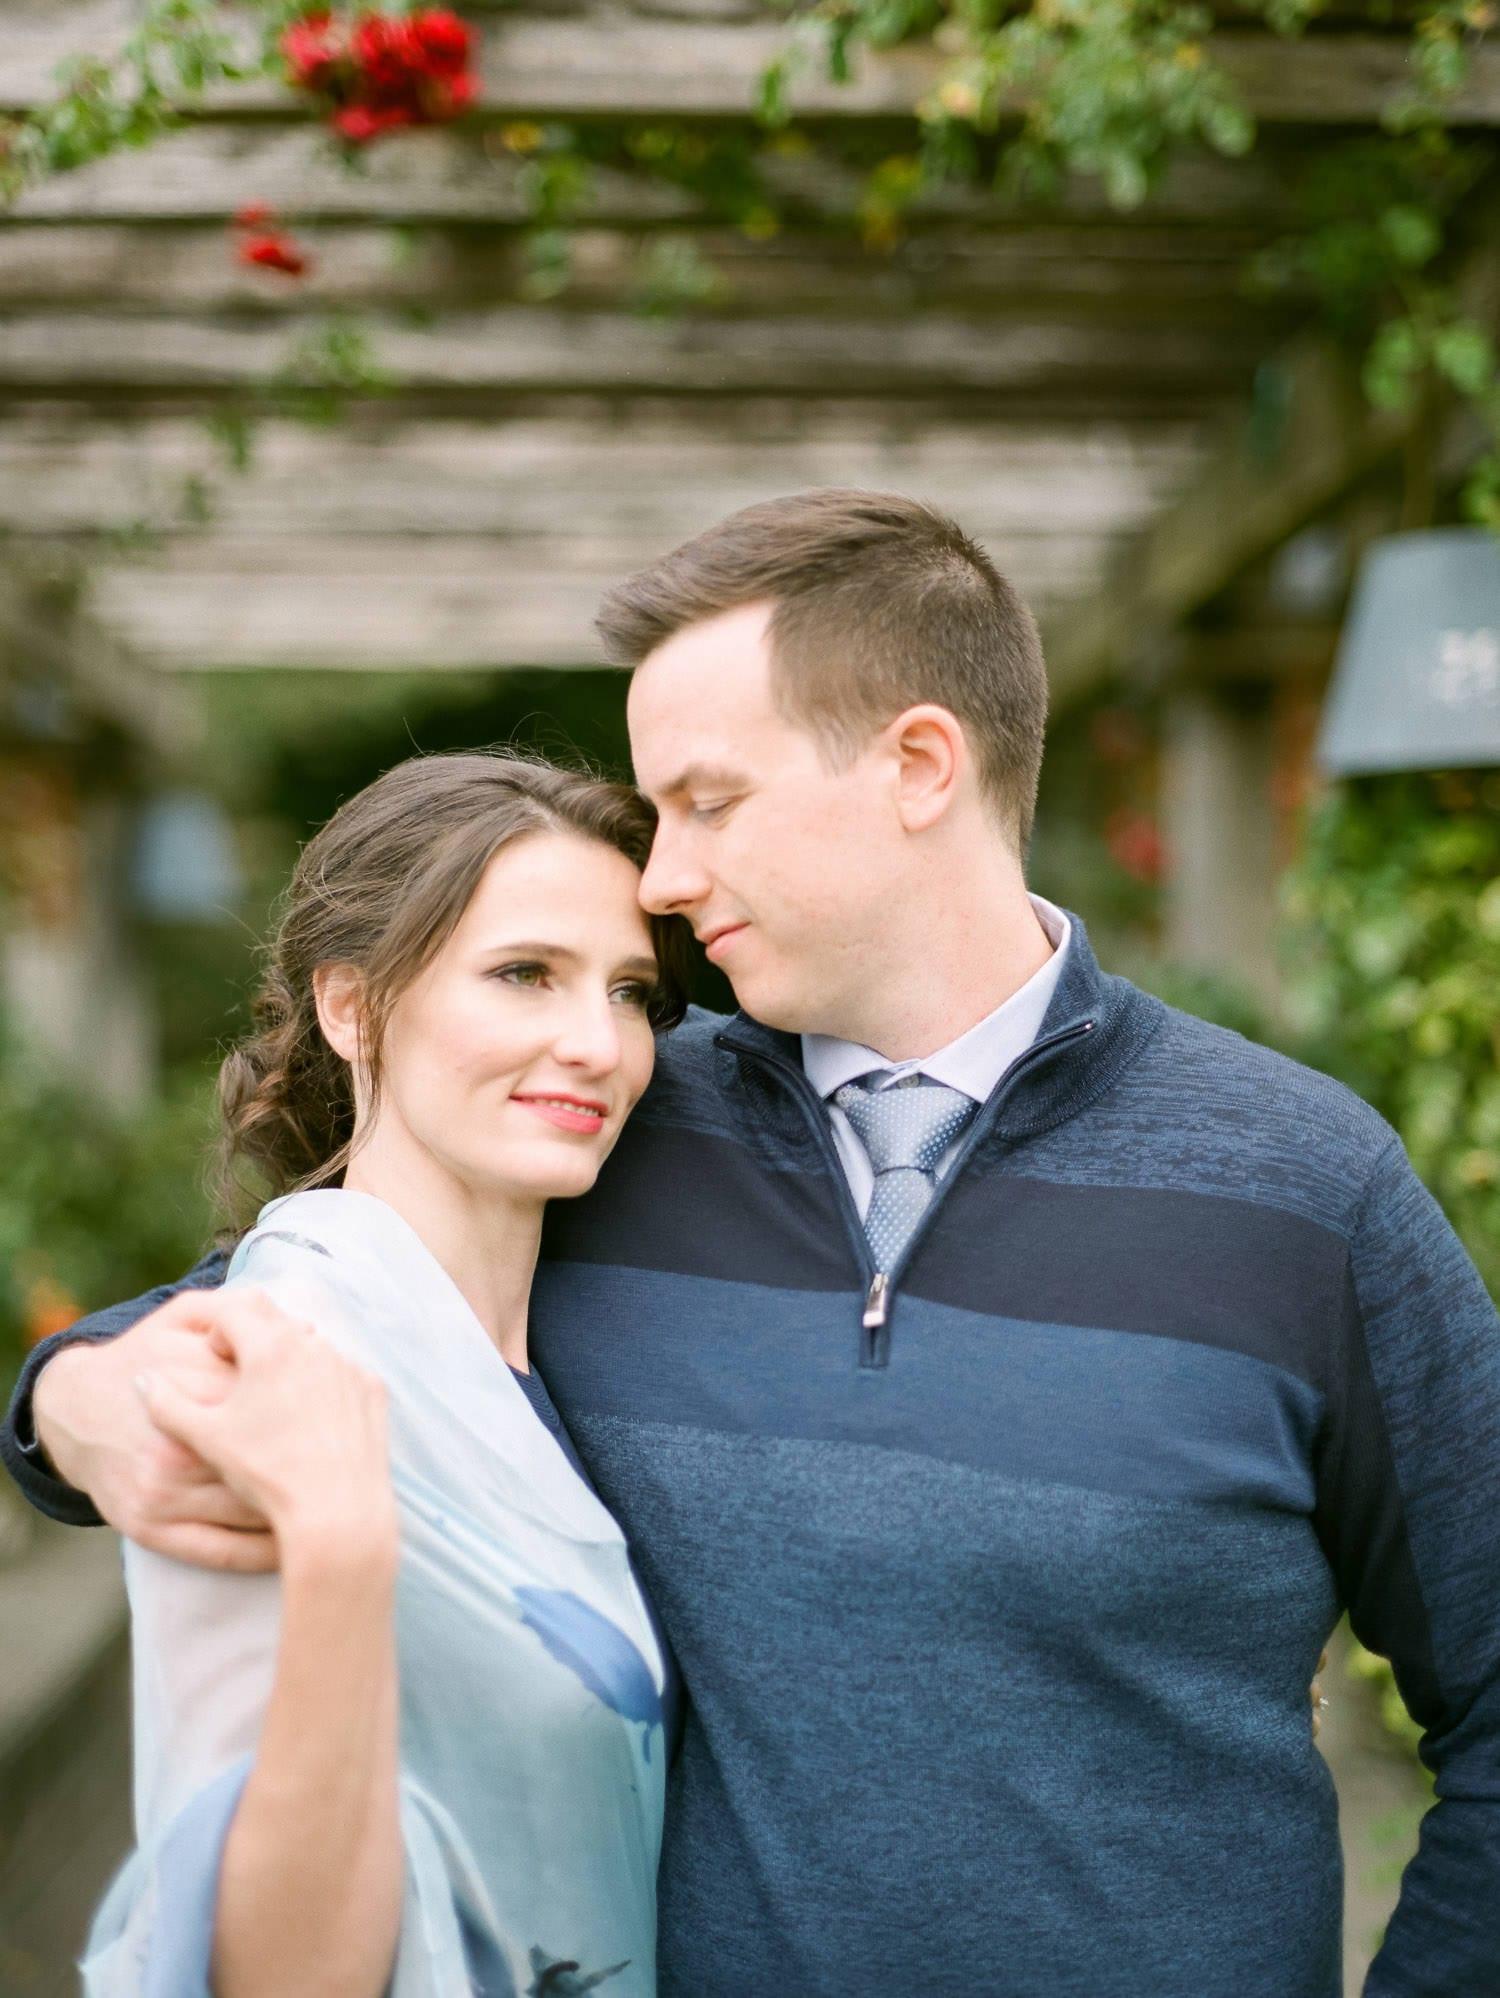 Engagement photo at UBC Rose Garden   Vancouver Fine Art Wedding Photographer